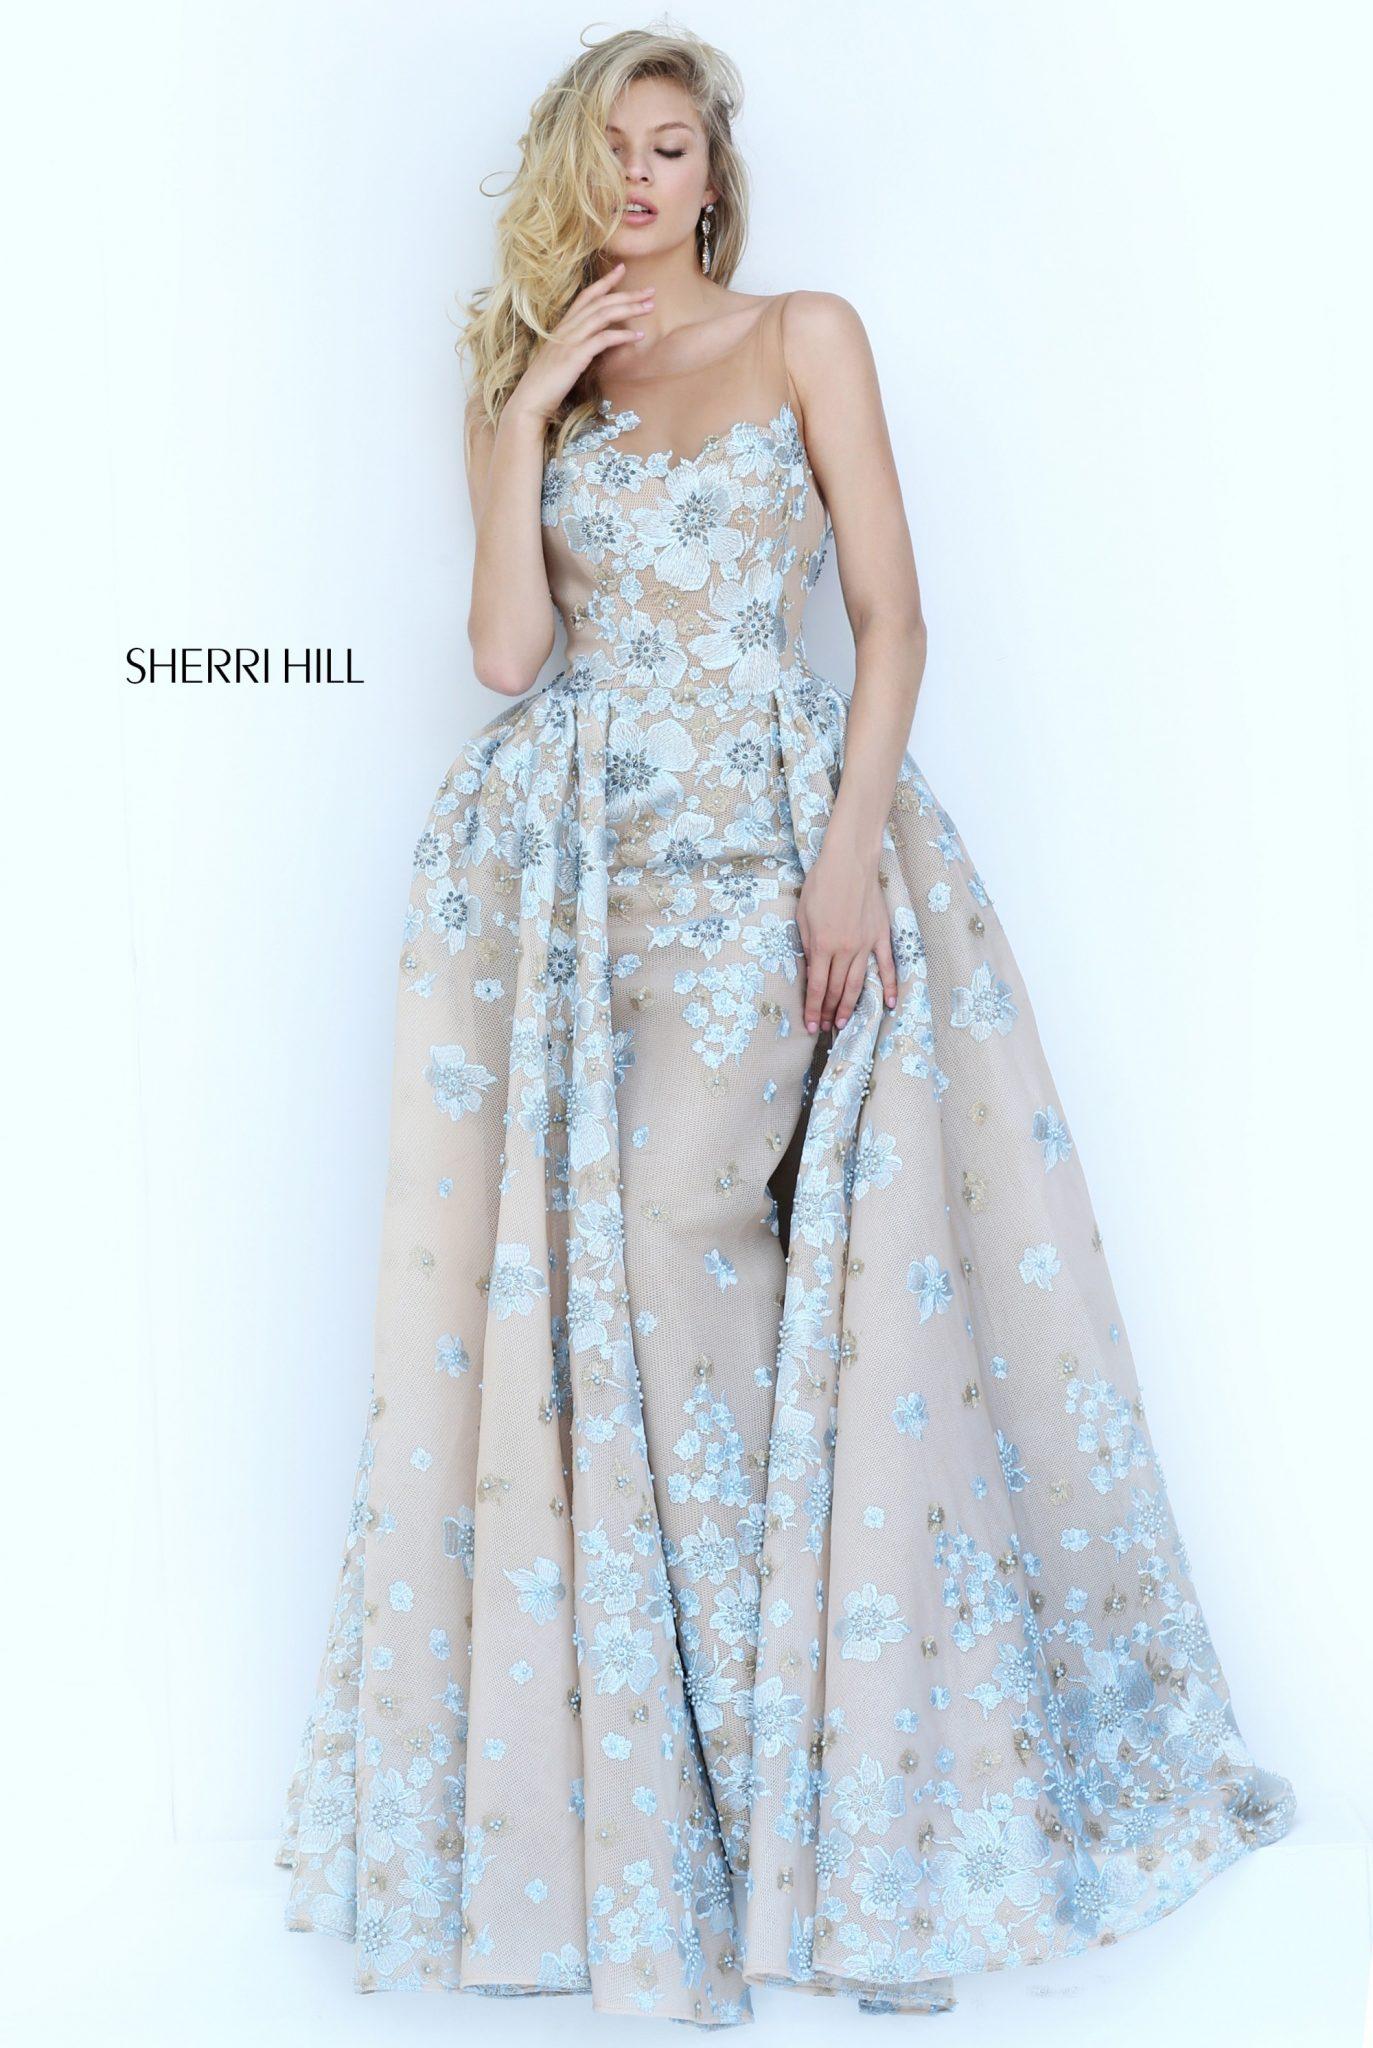 Sherri Hill Archives | Dress To Go